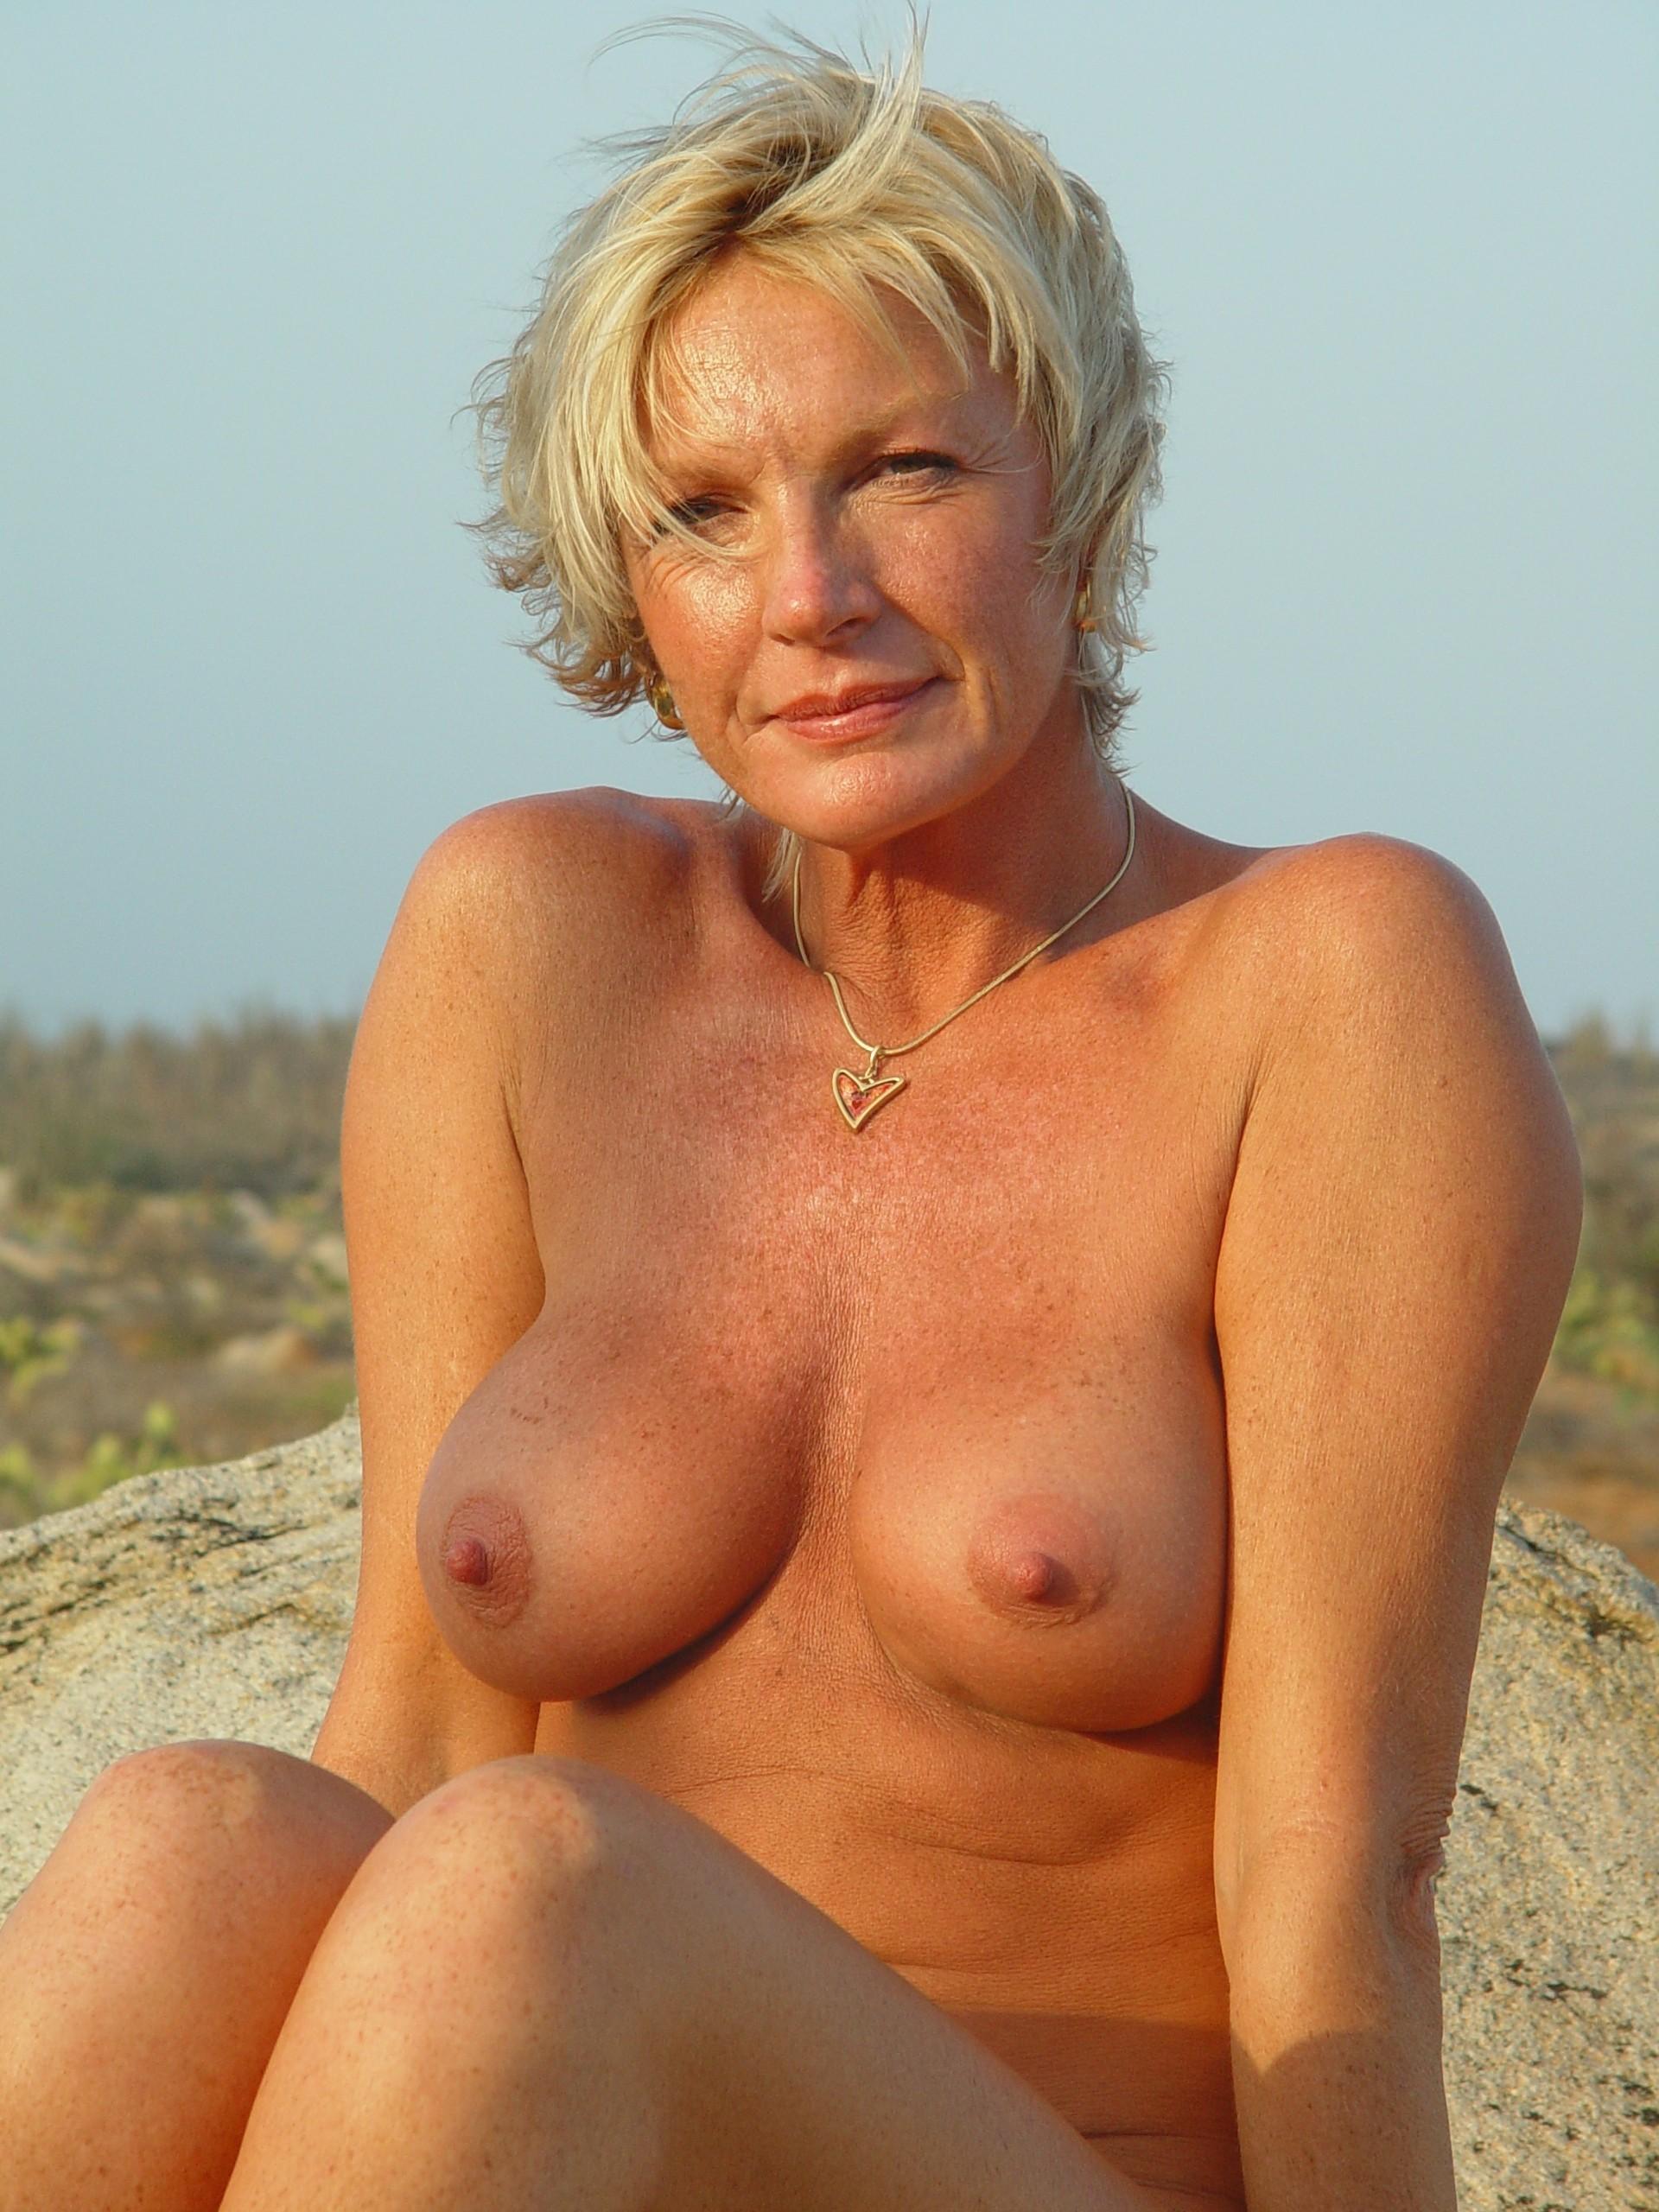 Mature women spanked pics